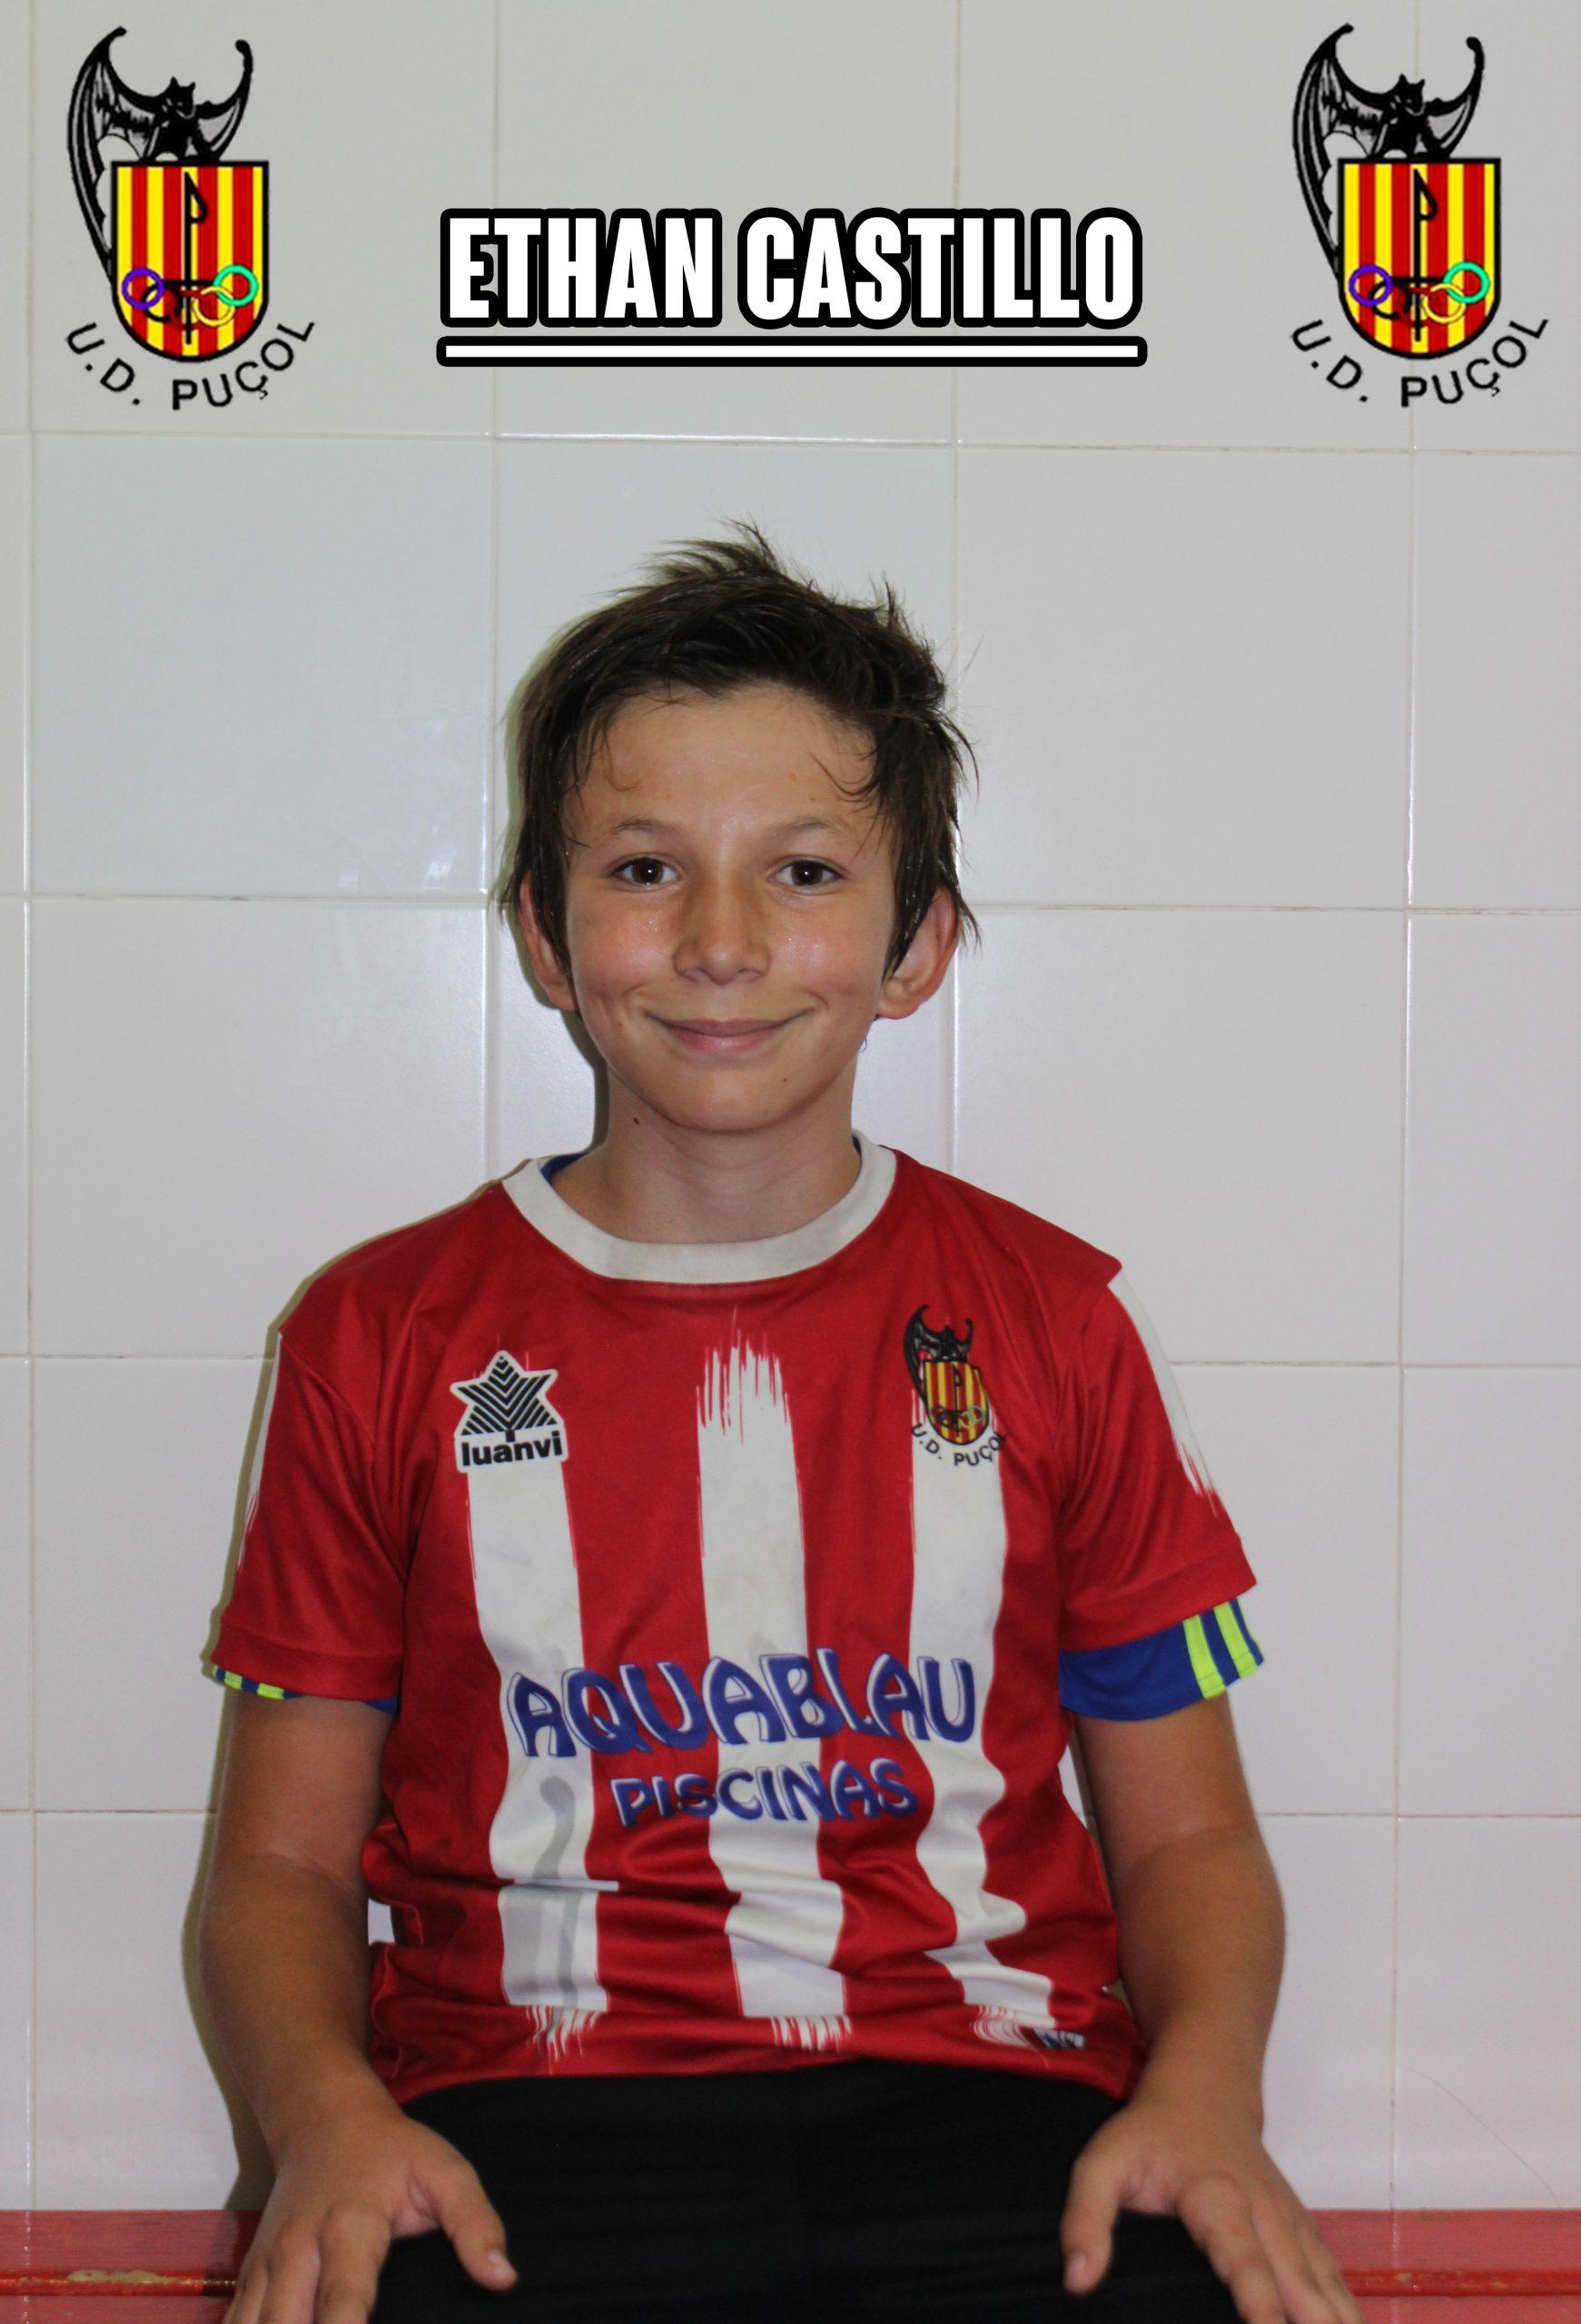 Ethan Castillo